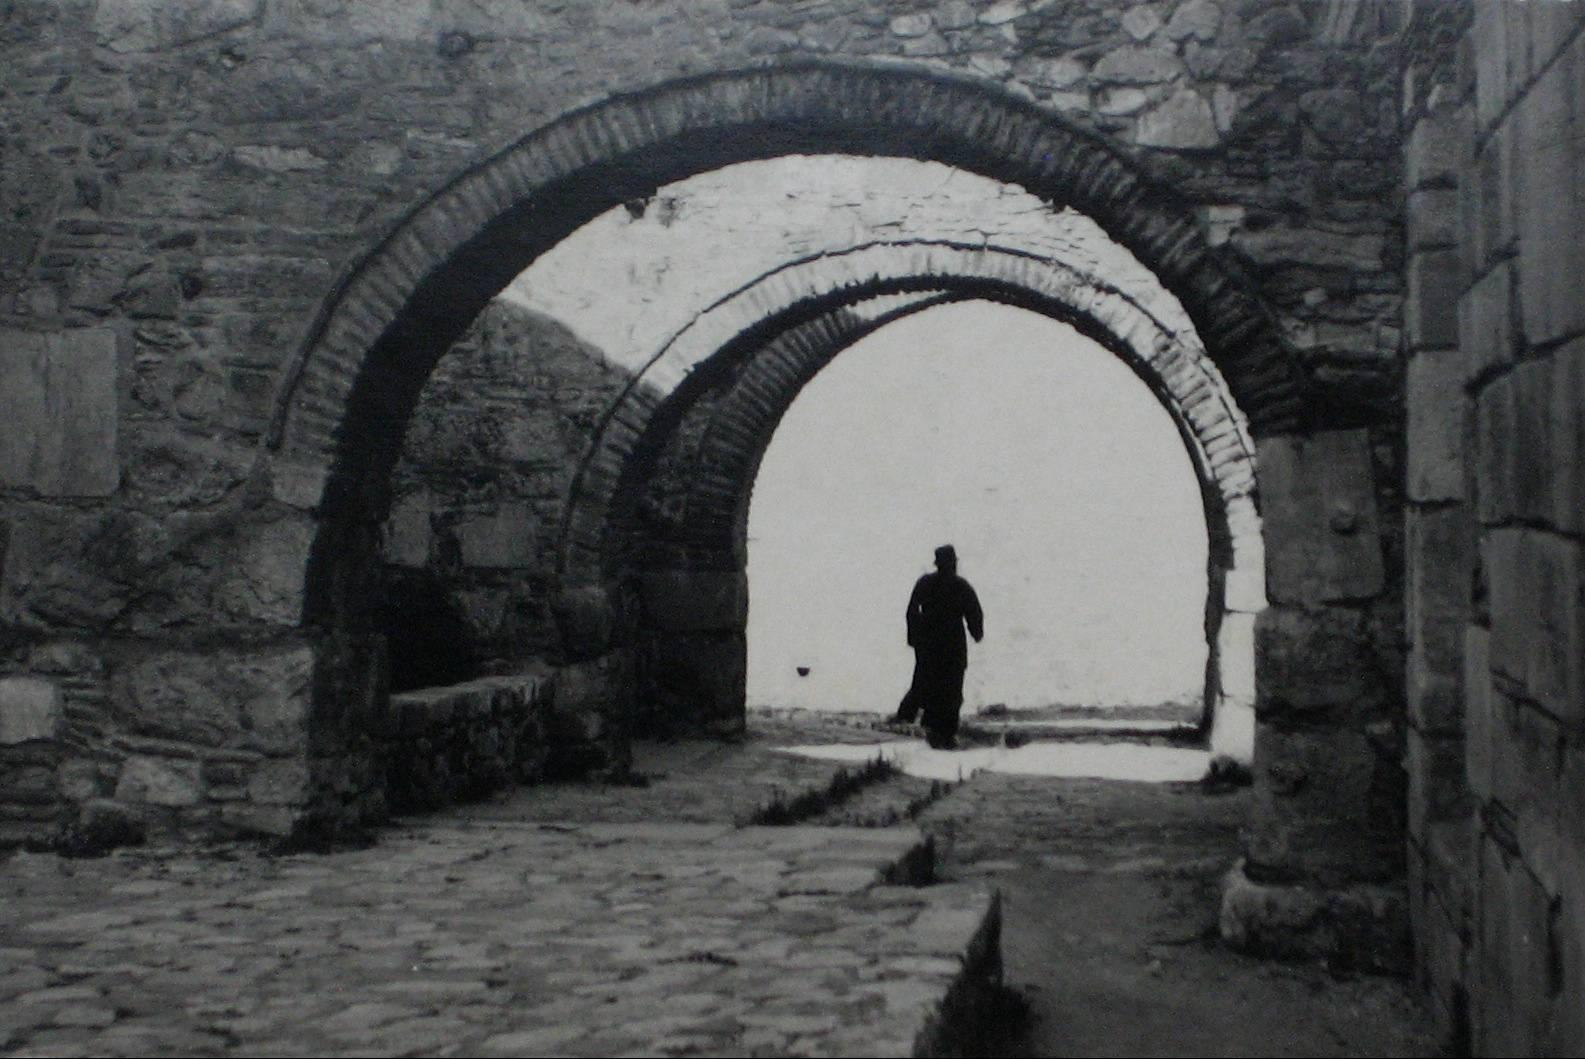 Man on City Streets, Yugoslavia, Black and White Photograph, 1960s